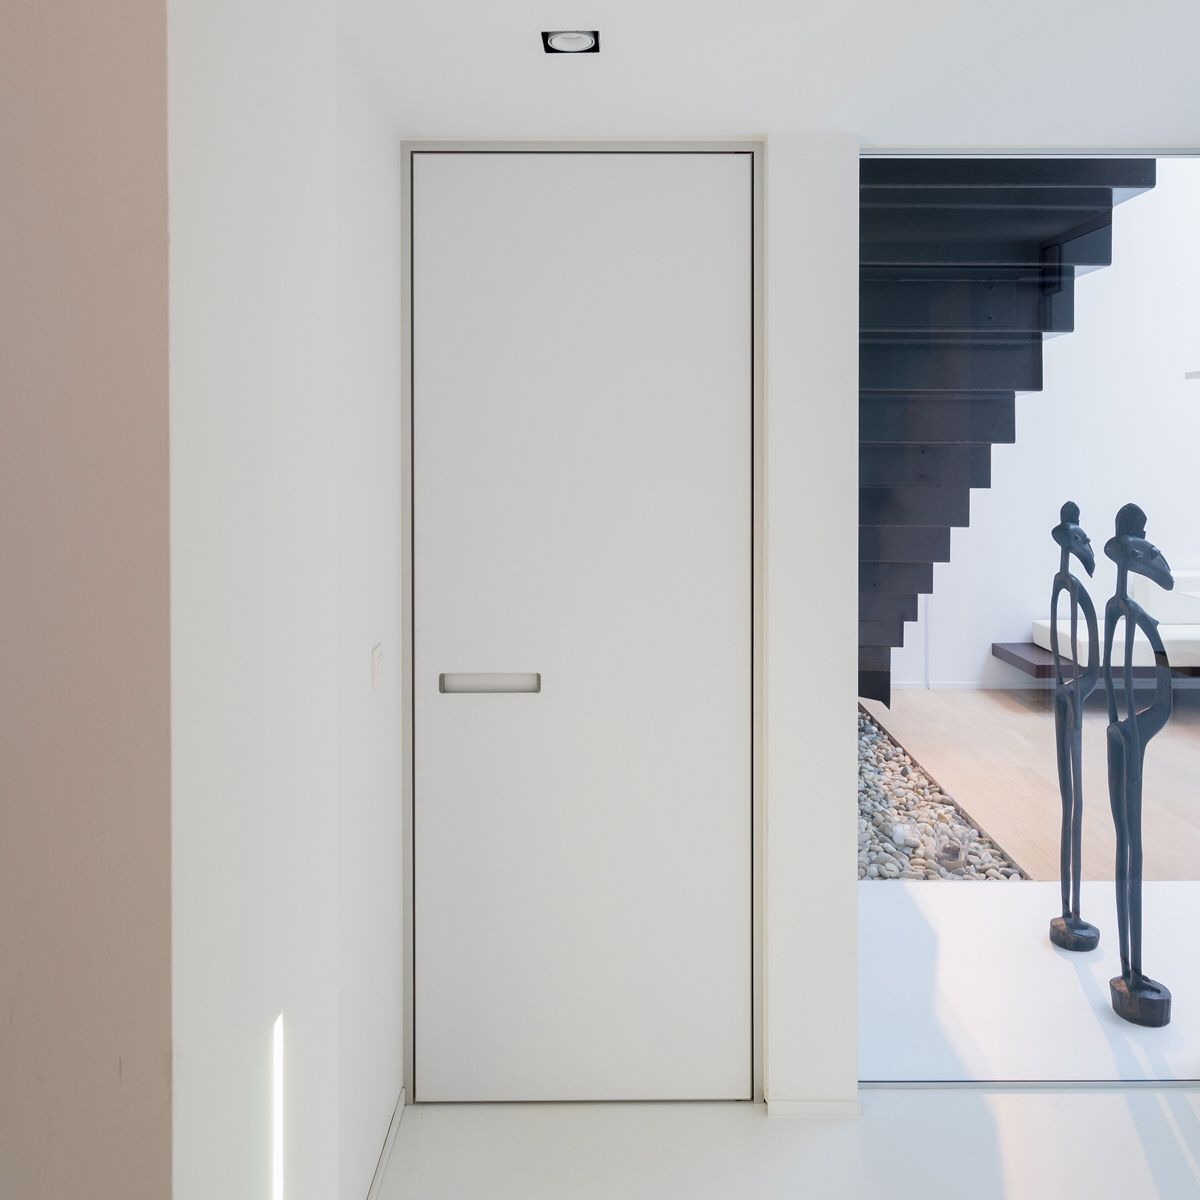 bdb887792a2 The minimalist aluminium Block-frame gives the door a frameless appearance.  Custom-made by Anyway Doors. Modern white interior ...